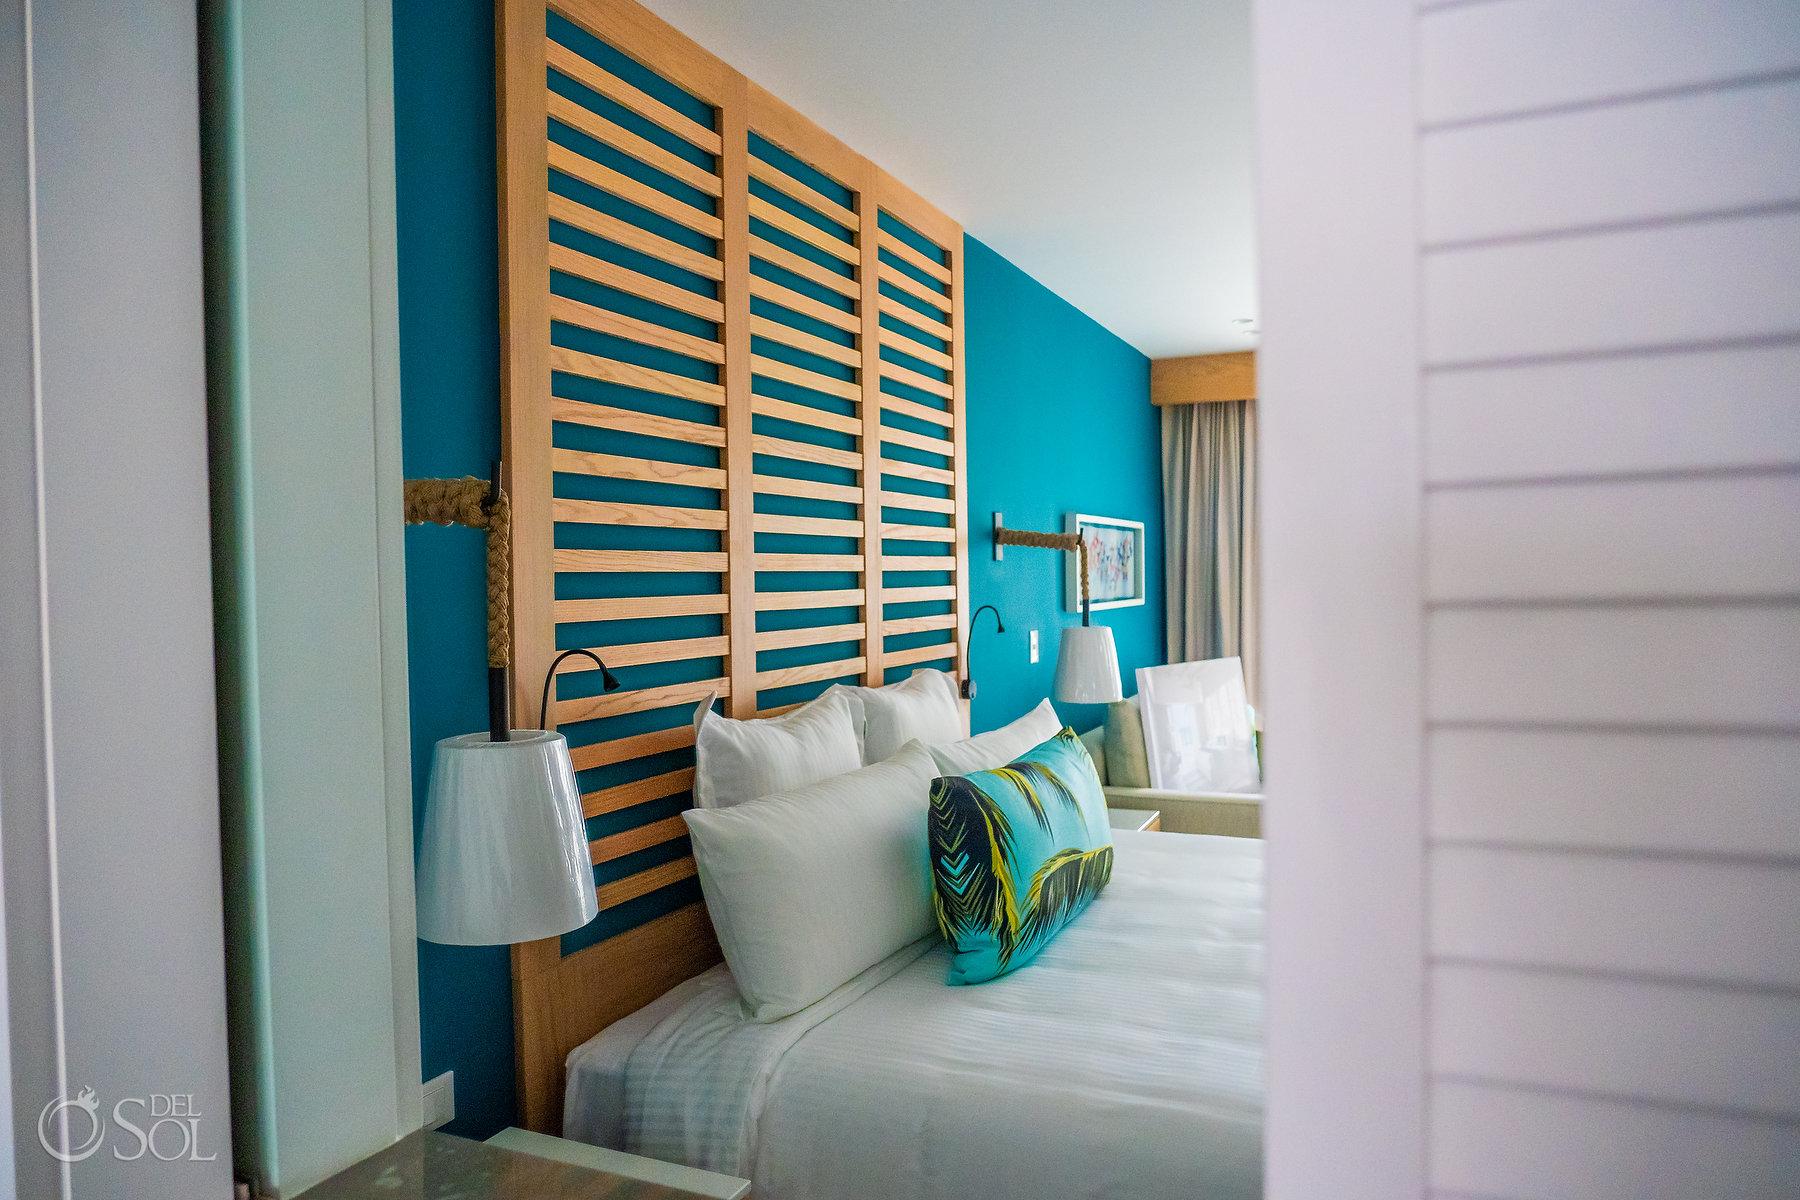 Now Natura room interior Riviera Cancun